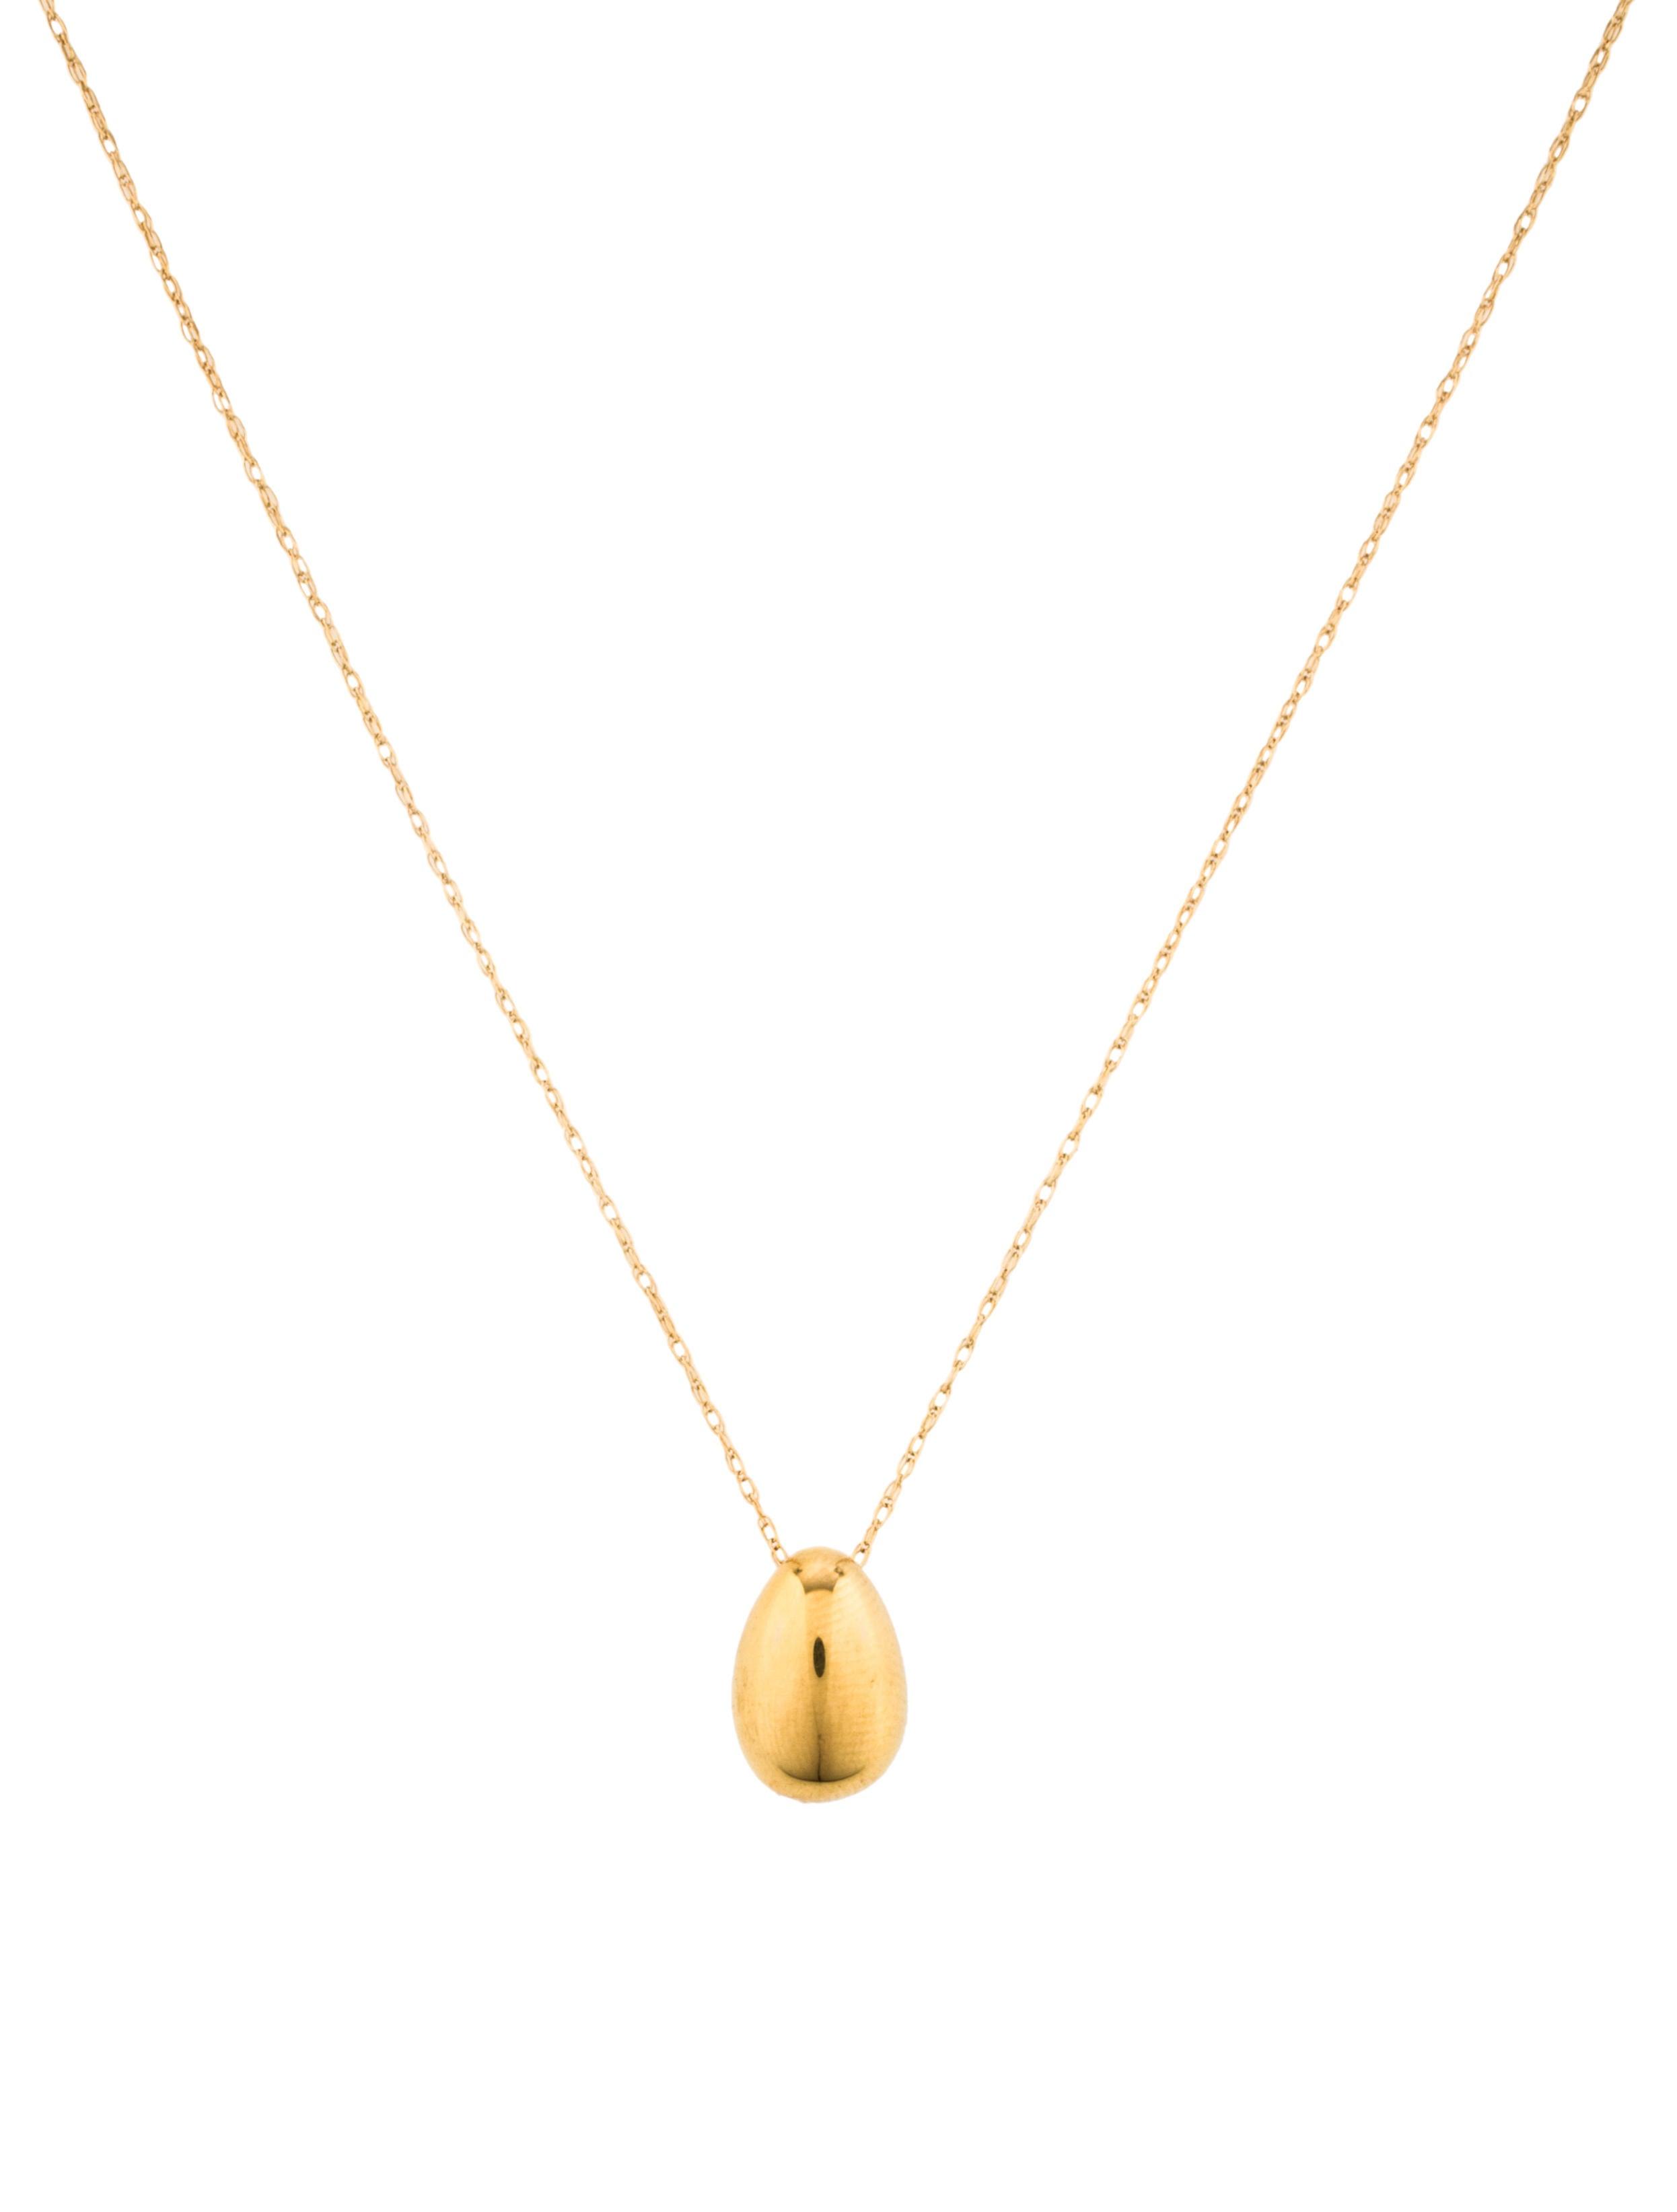 Sophie buhai tiny egg pendant necklace necklaces wsoph20003 tiny egg pendant necklace mozeypictures Gallery